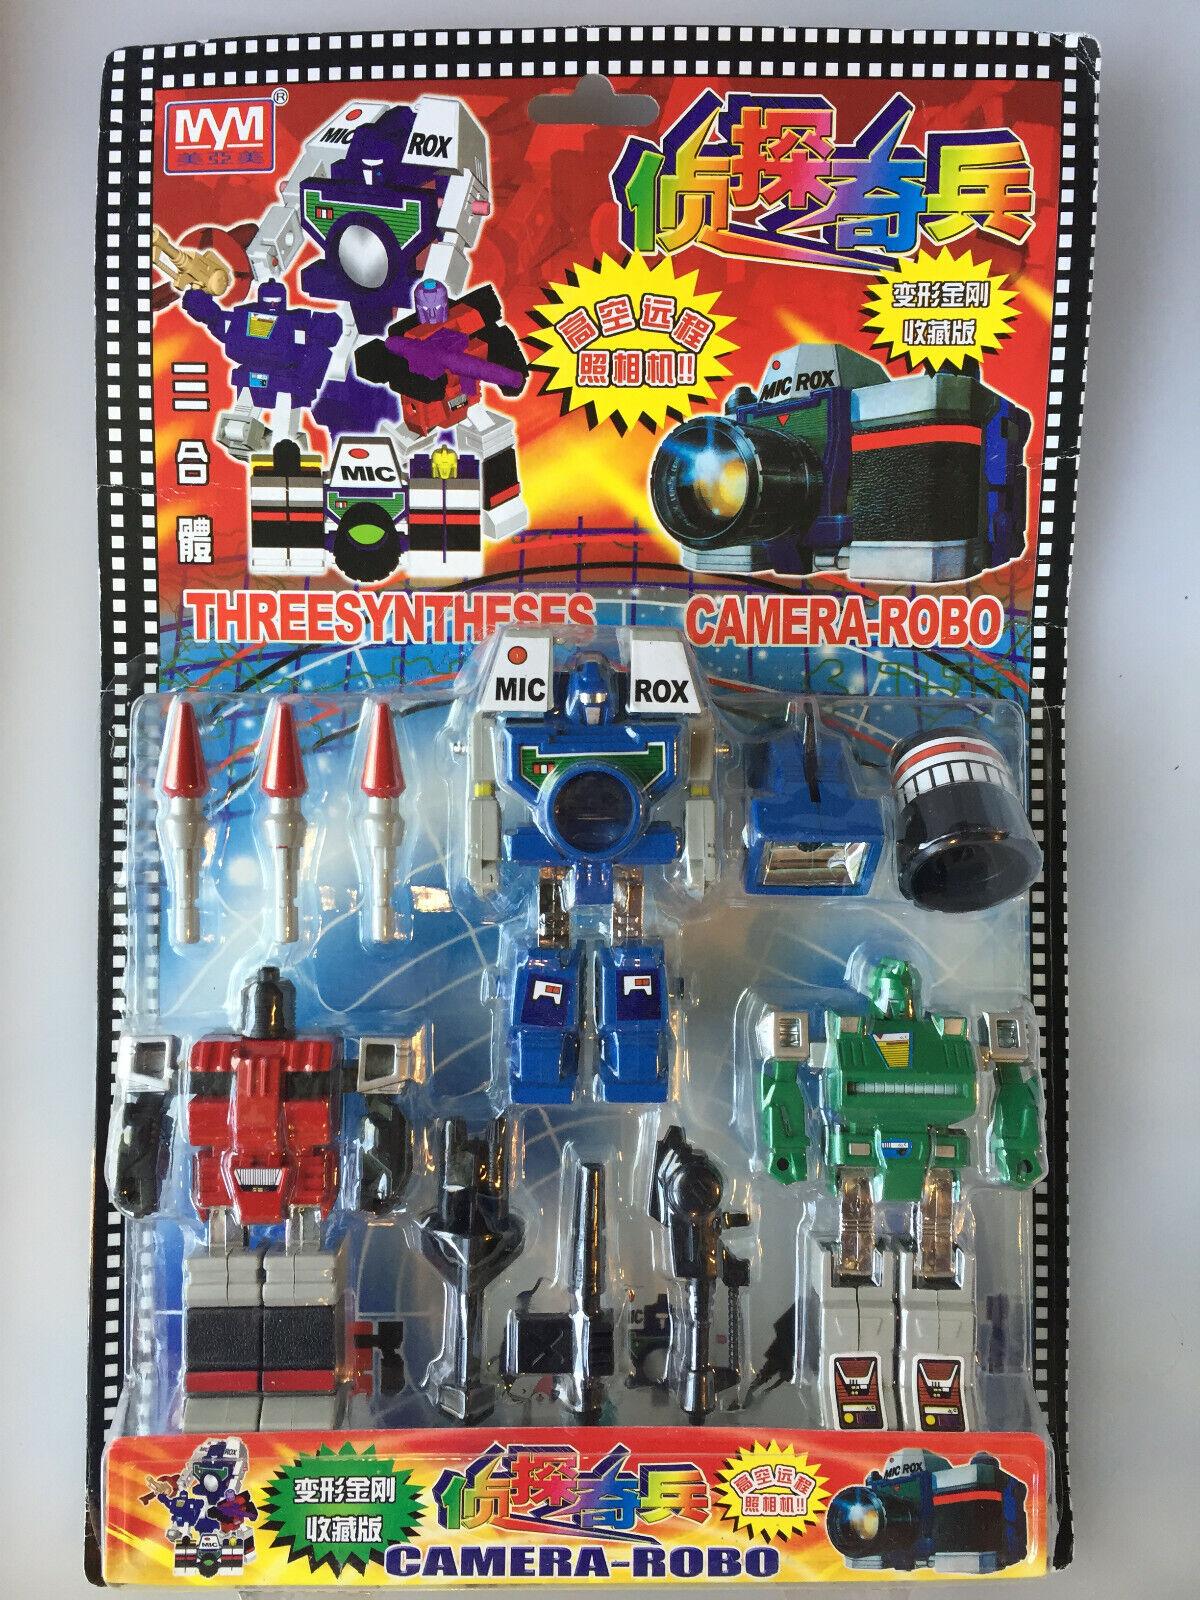 Transformers G1 REFLECTOR Camera-Robo KO Threesynthesis NEW MOSC unopened RARE